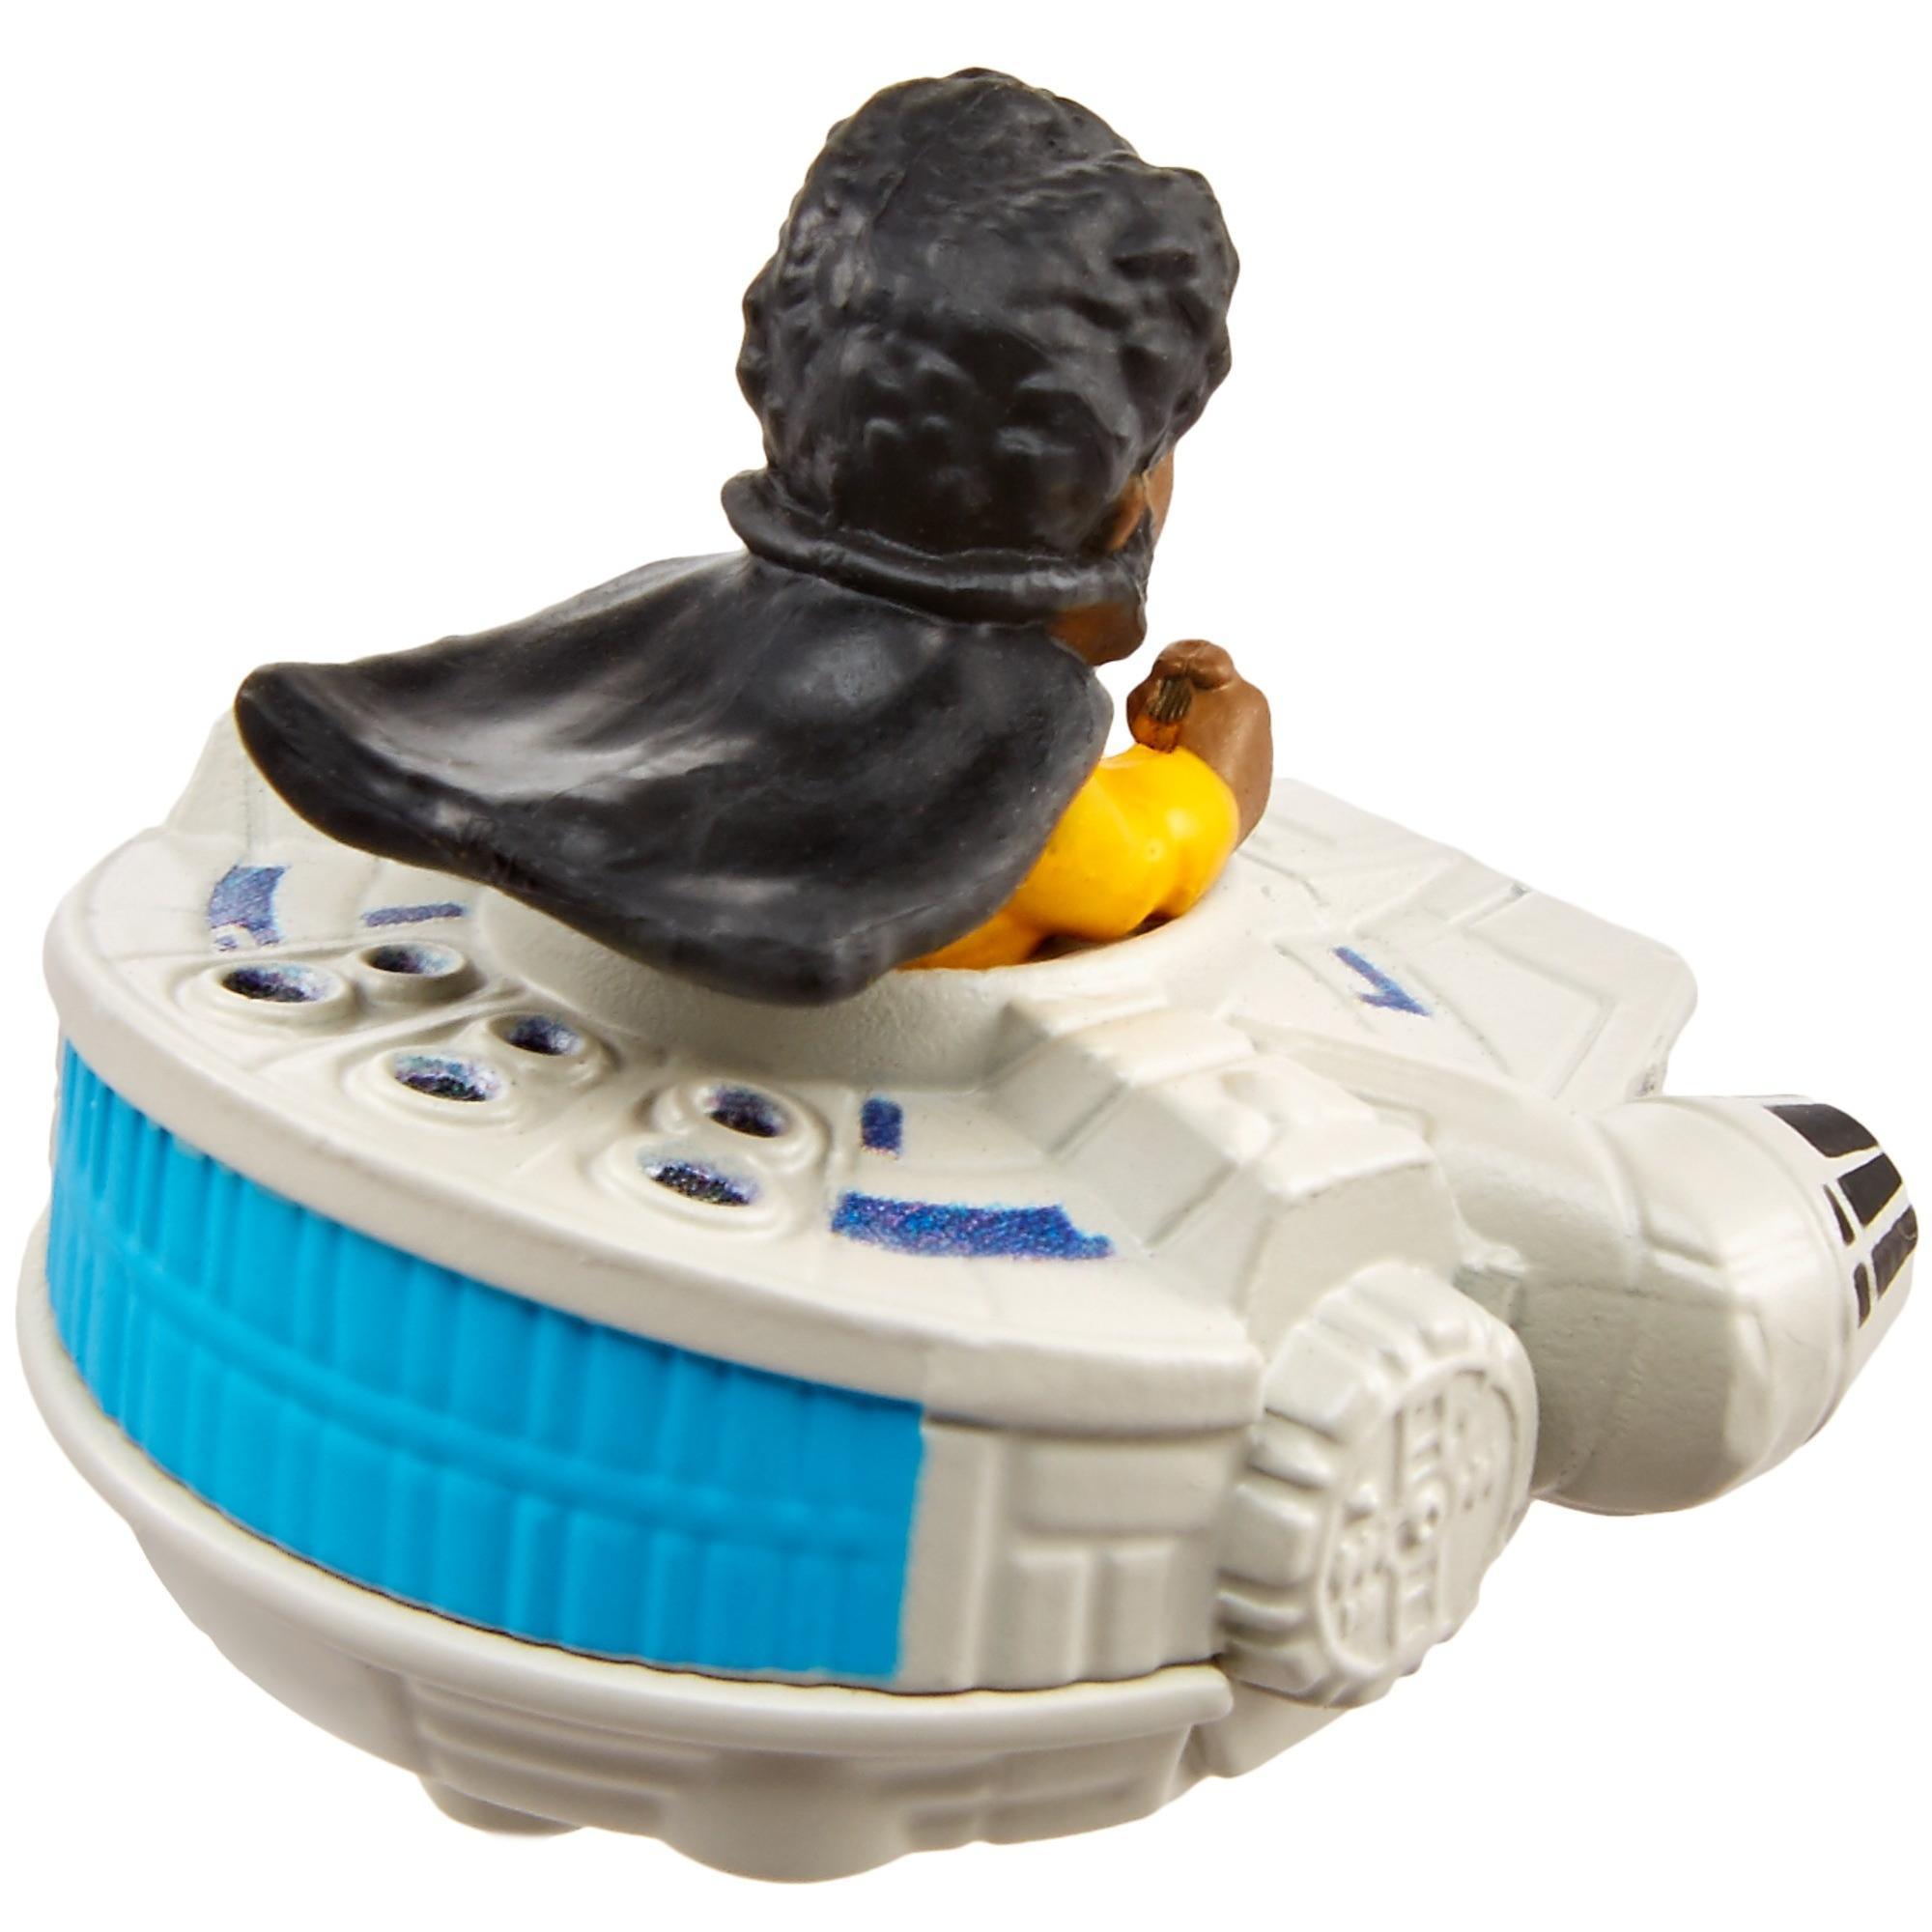 Solo: ASWS HW Lando Calrissian Battle Roller Toy 3